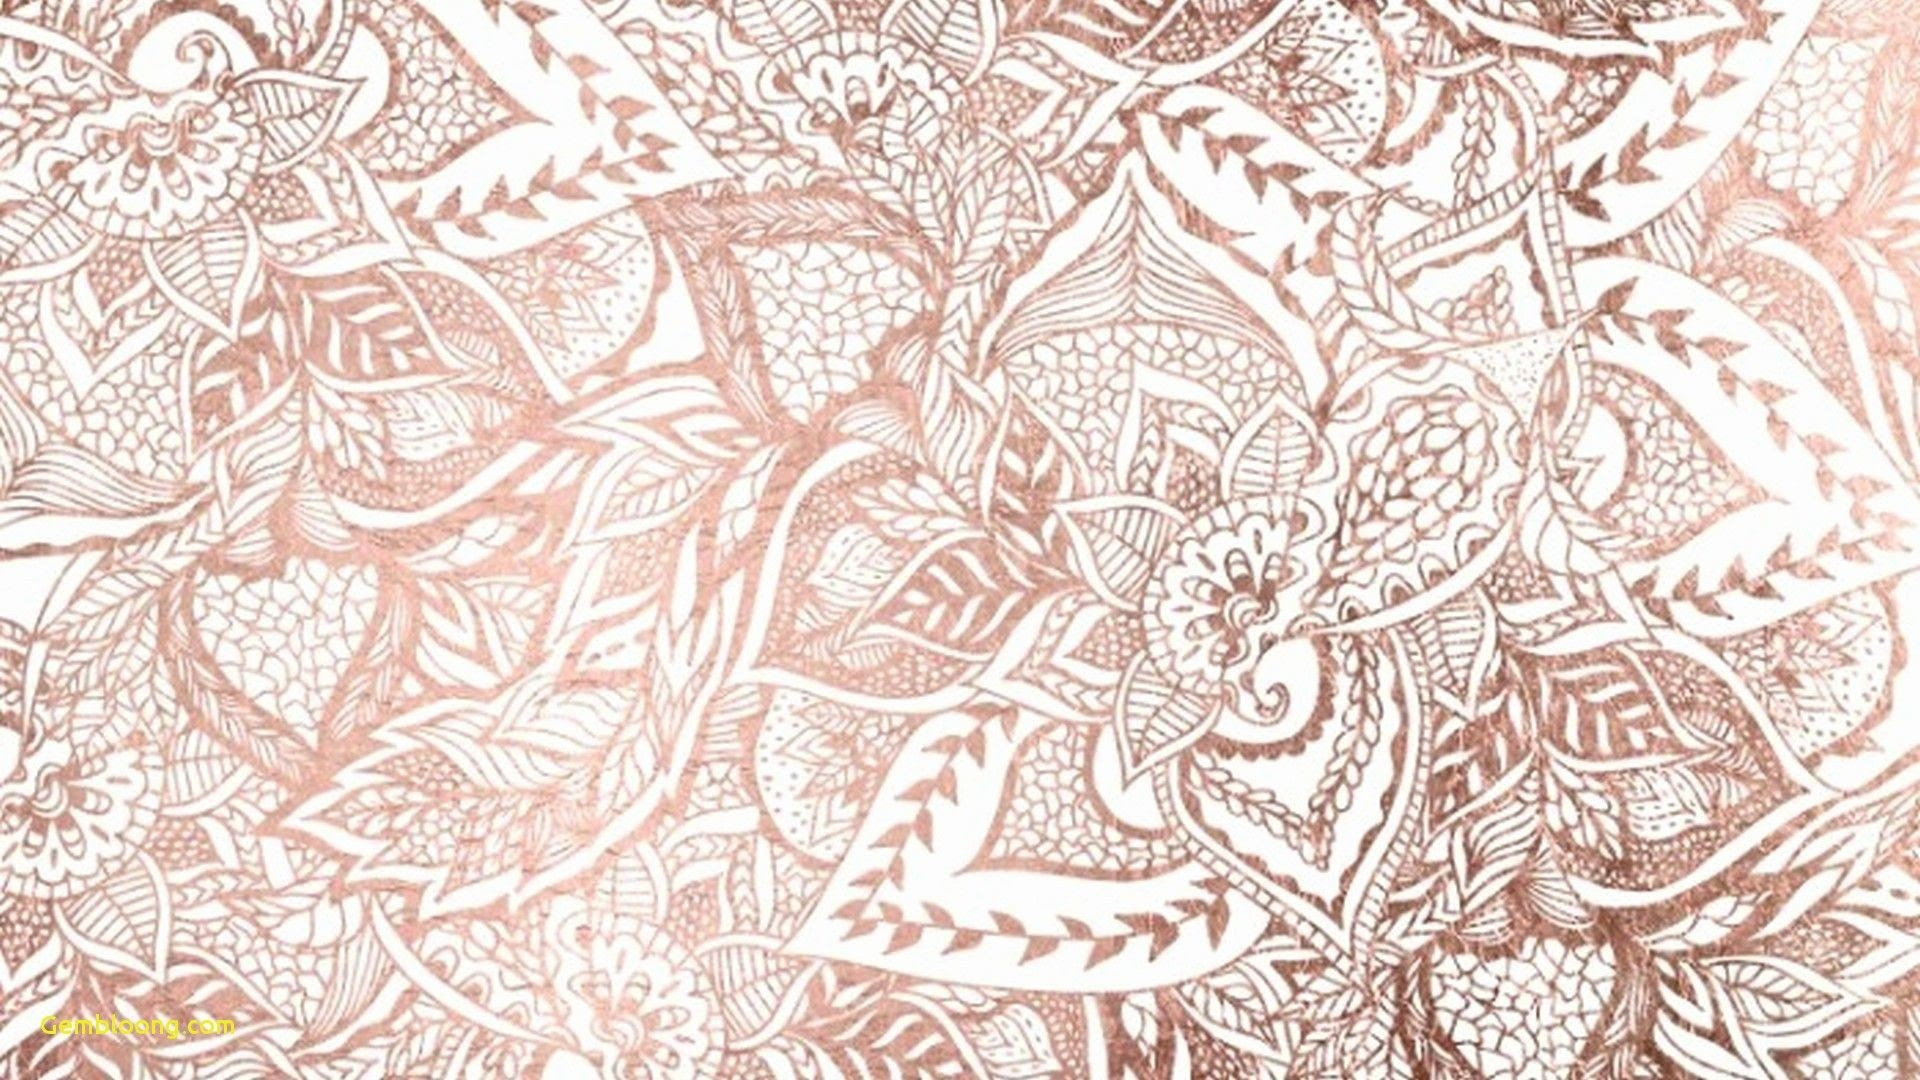 Rose Gold Marble Desktop Wallpaper Hd